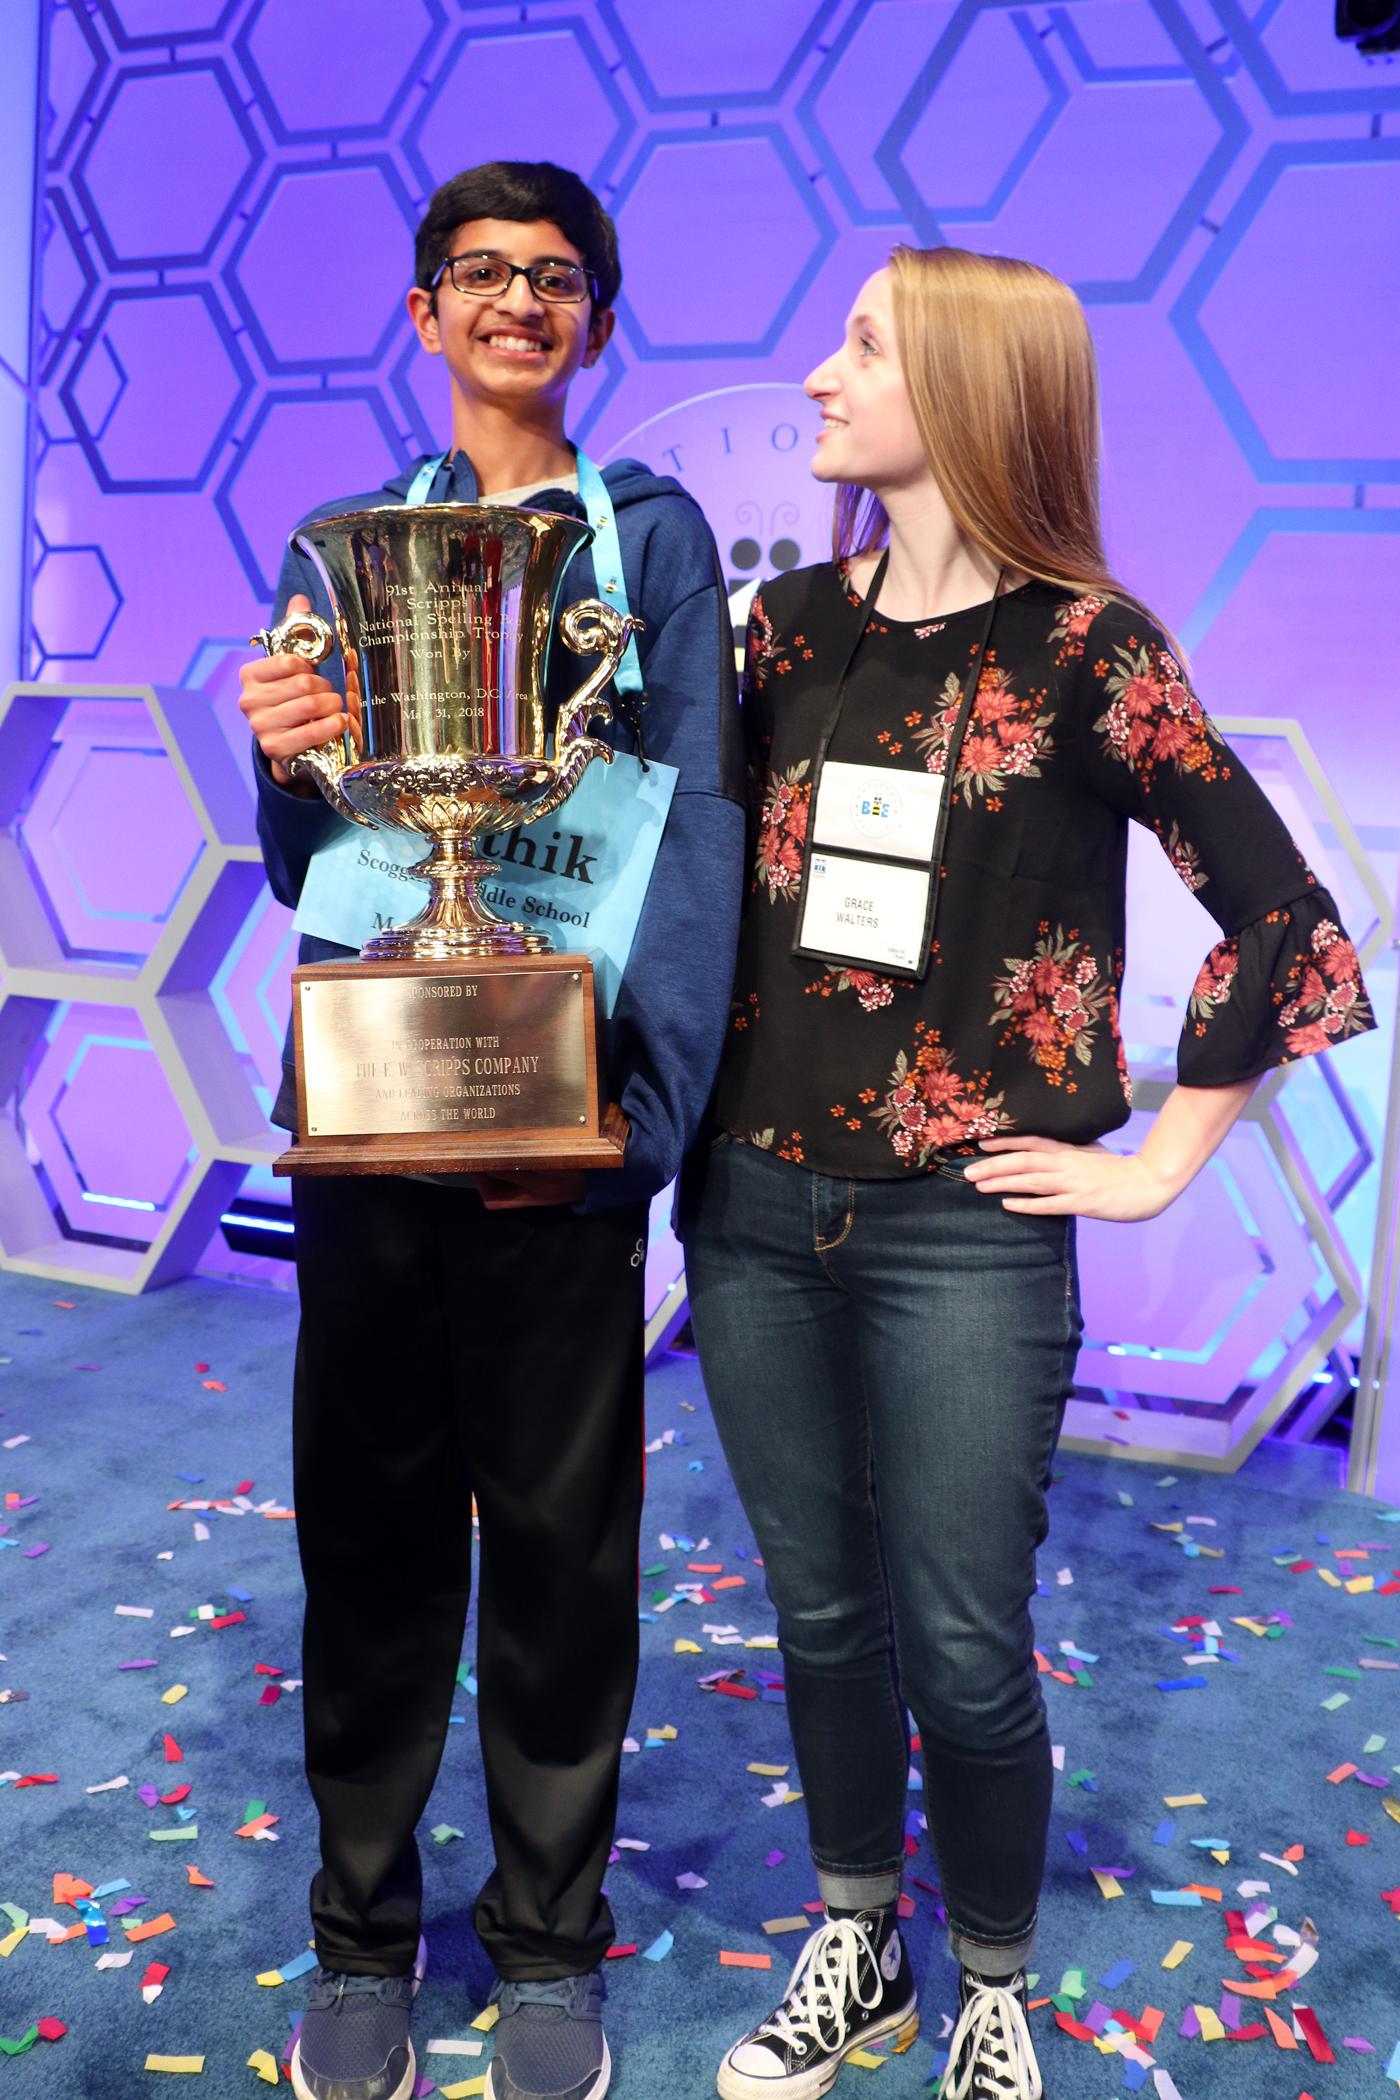 Scripps National Spelling Bee winner Karthik Nemmani with his coach, Grace Walters